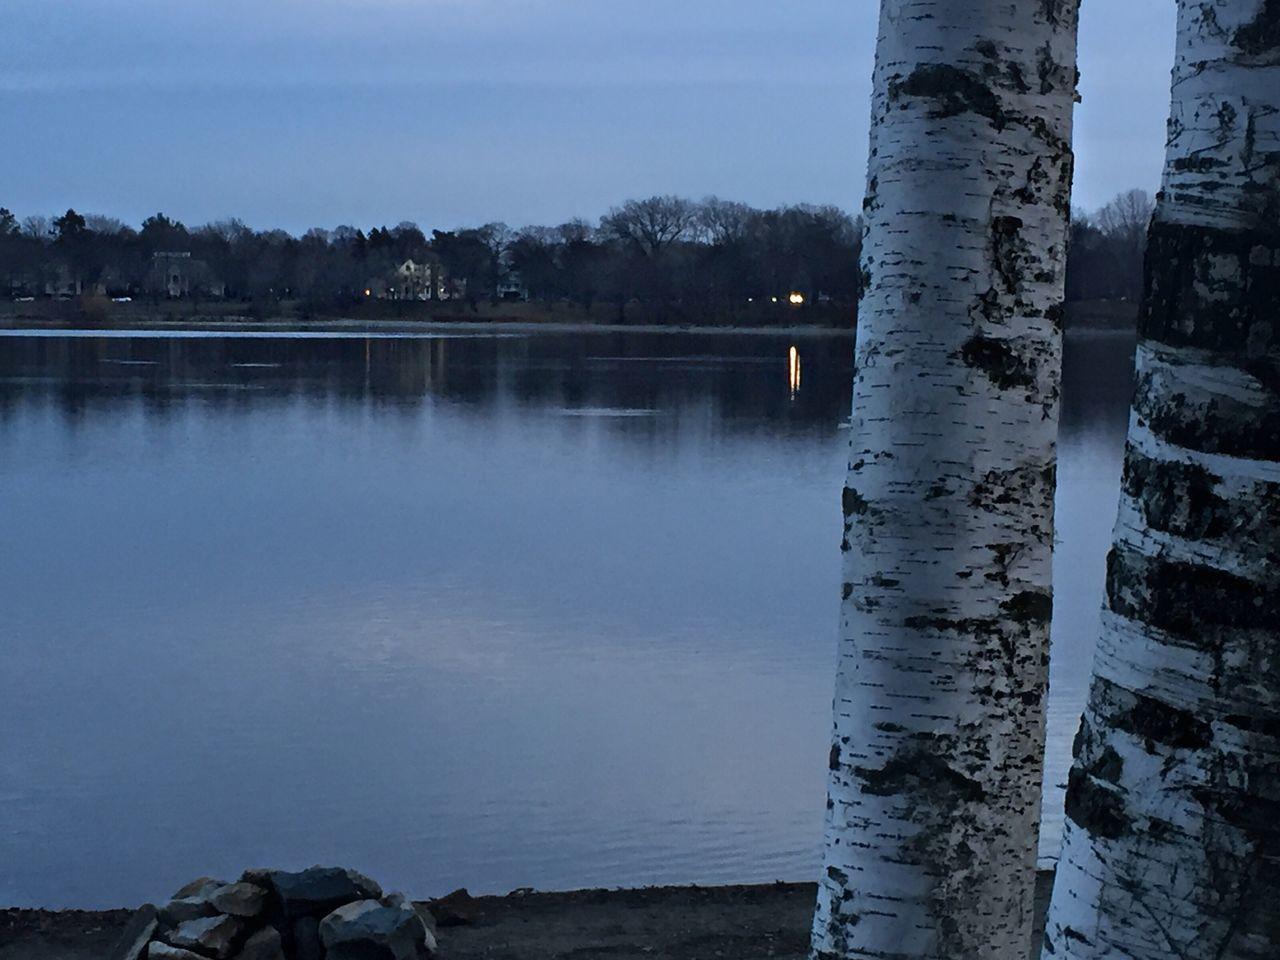 Birch tree series Winter Solstice Landscape Trees Nofilter